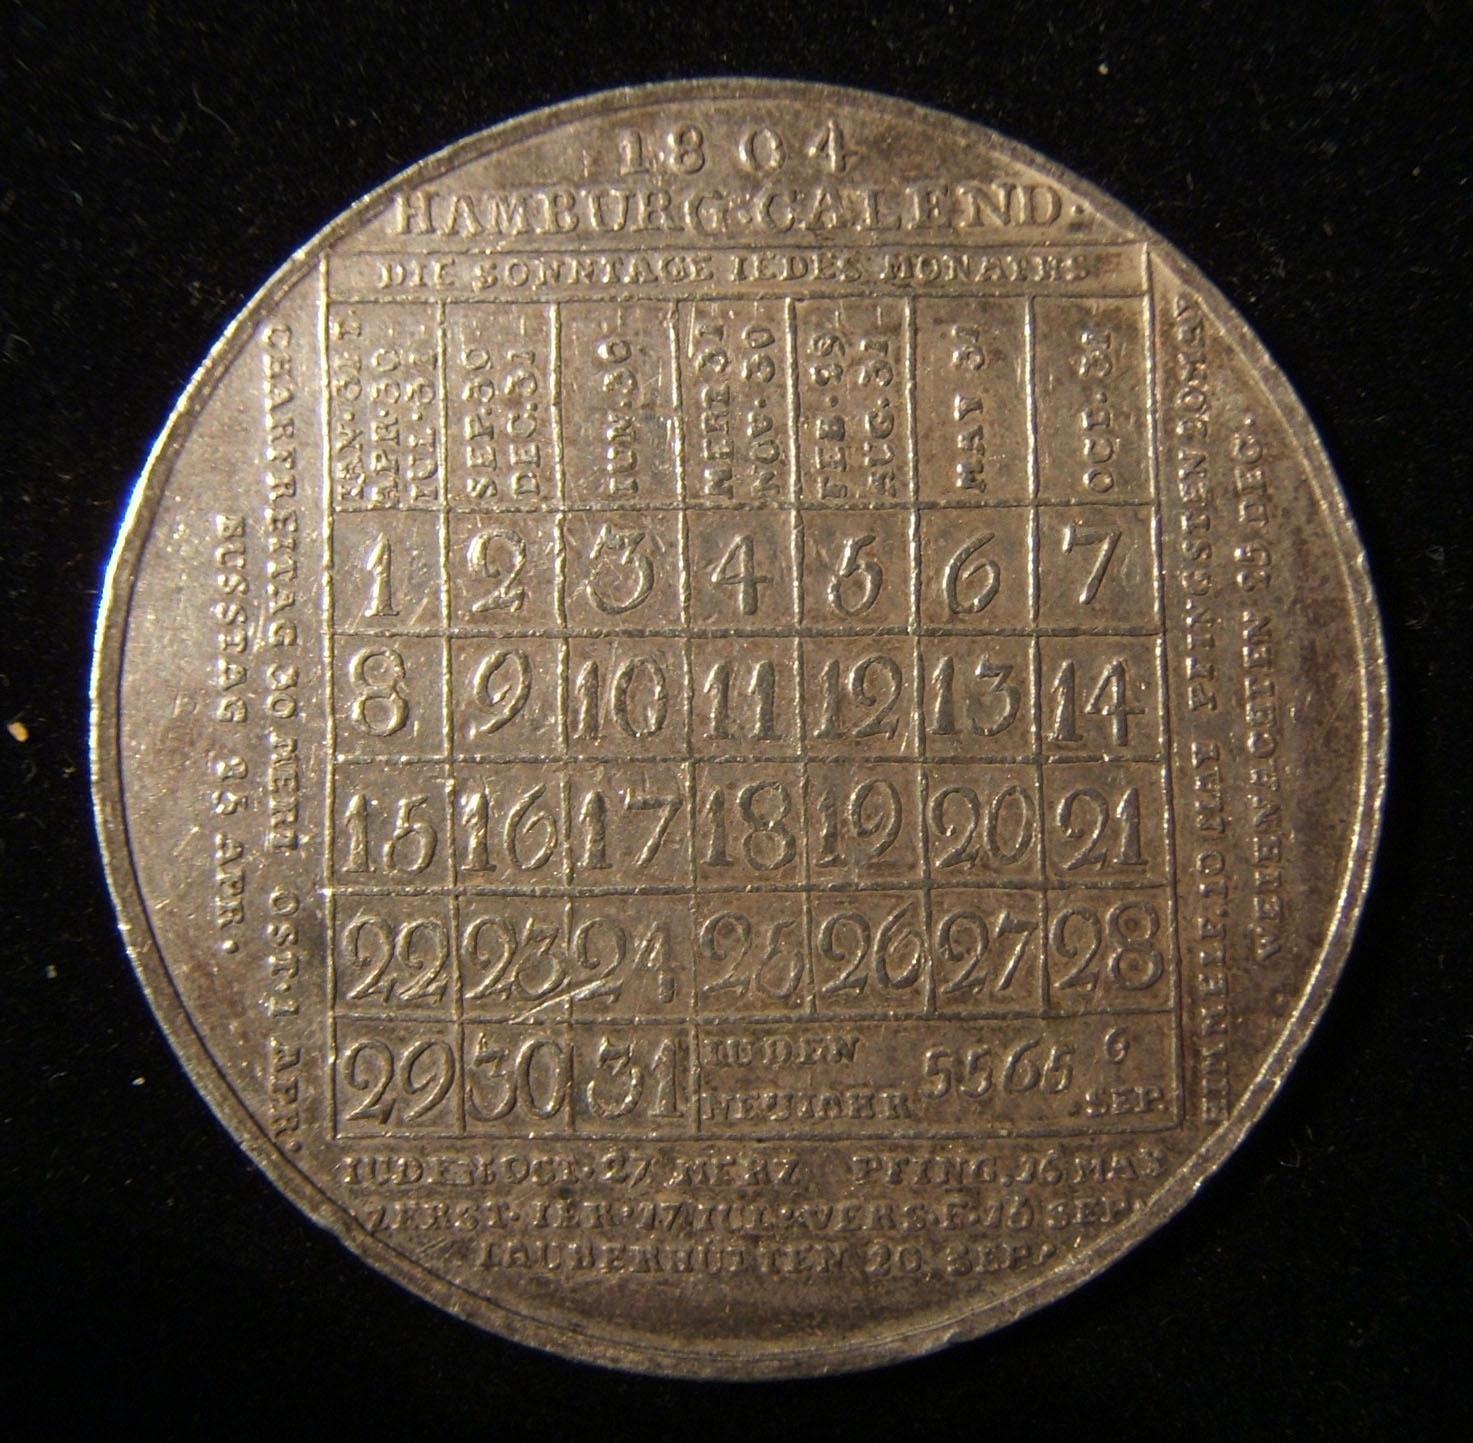 Germany > Hamburg: Jewish calendar medal (